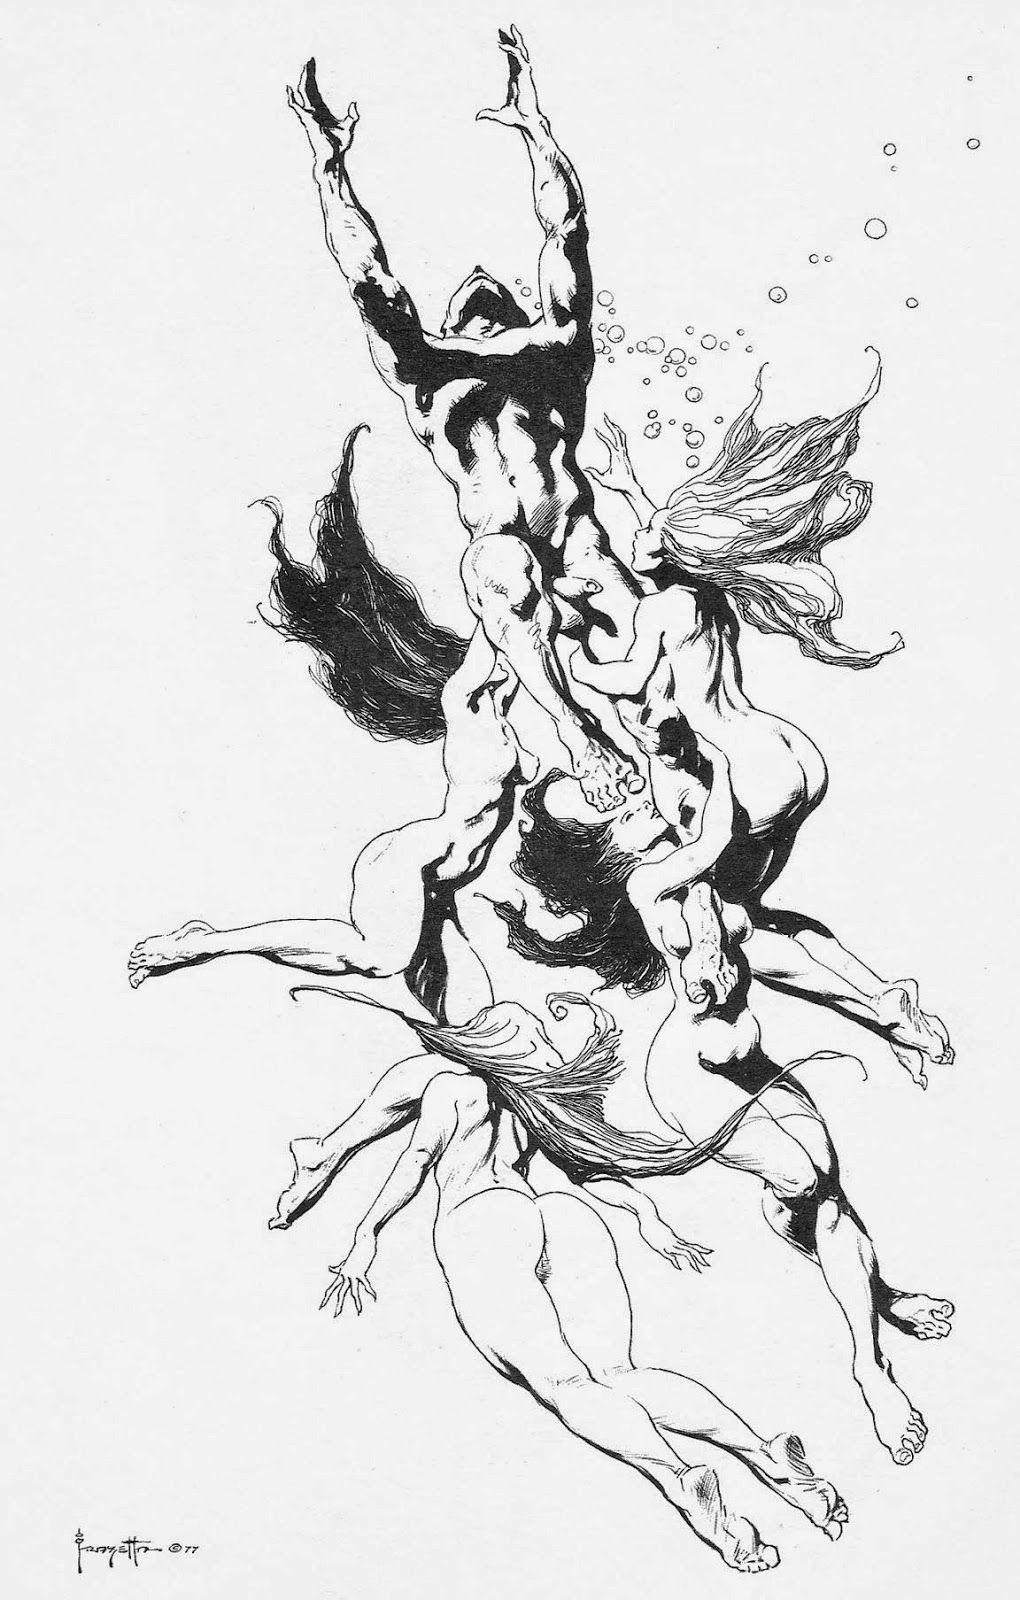 maidens+of+the+deep+1.jpg (1020×1600)   Frazetta   Pinterest   Frank ...